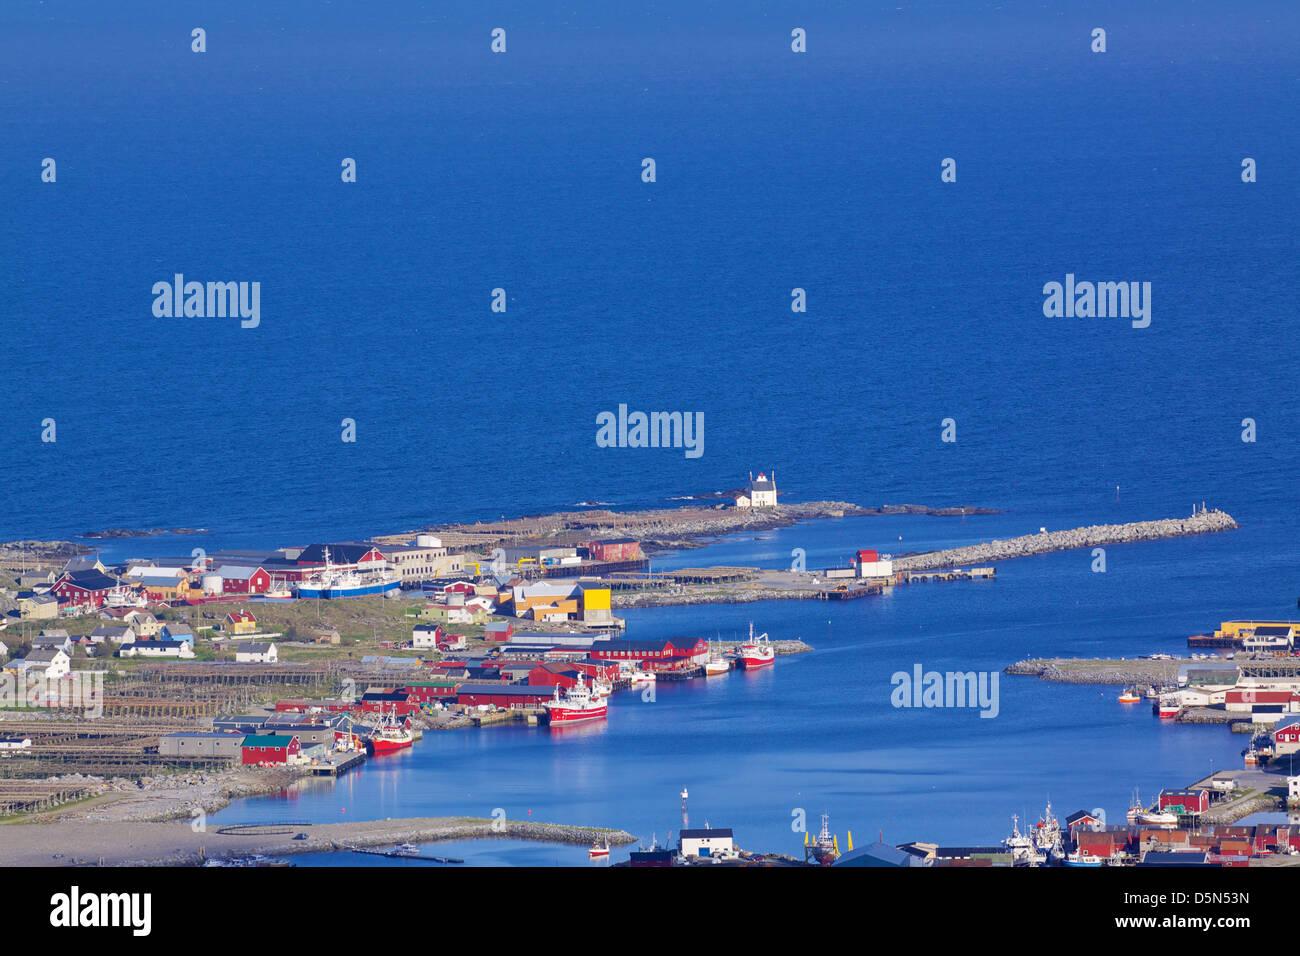 Scenic fishing harbor of Sorland on Vaeroy, Lofoten islands, Norway - Stock Image